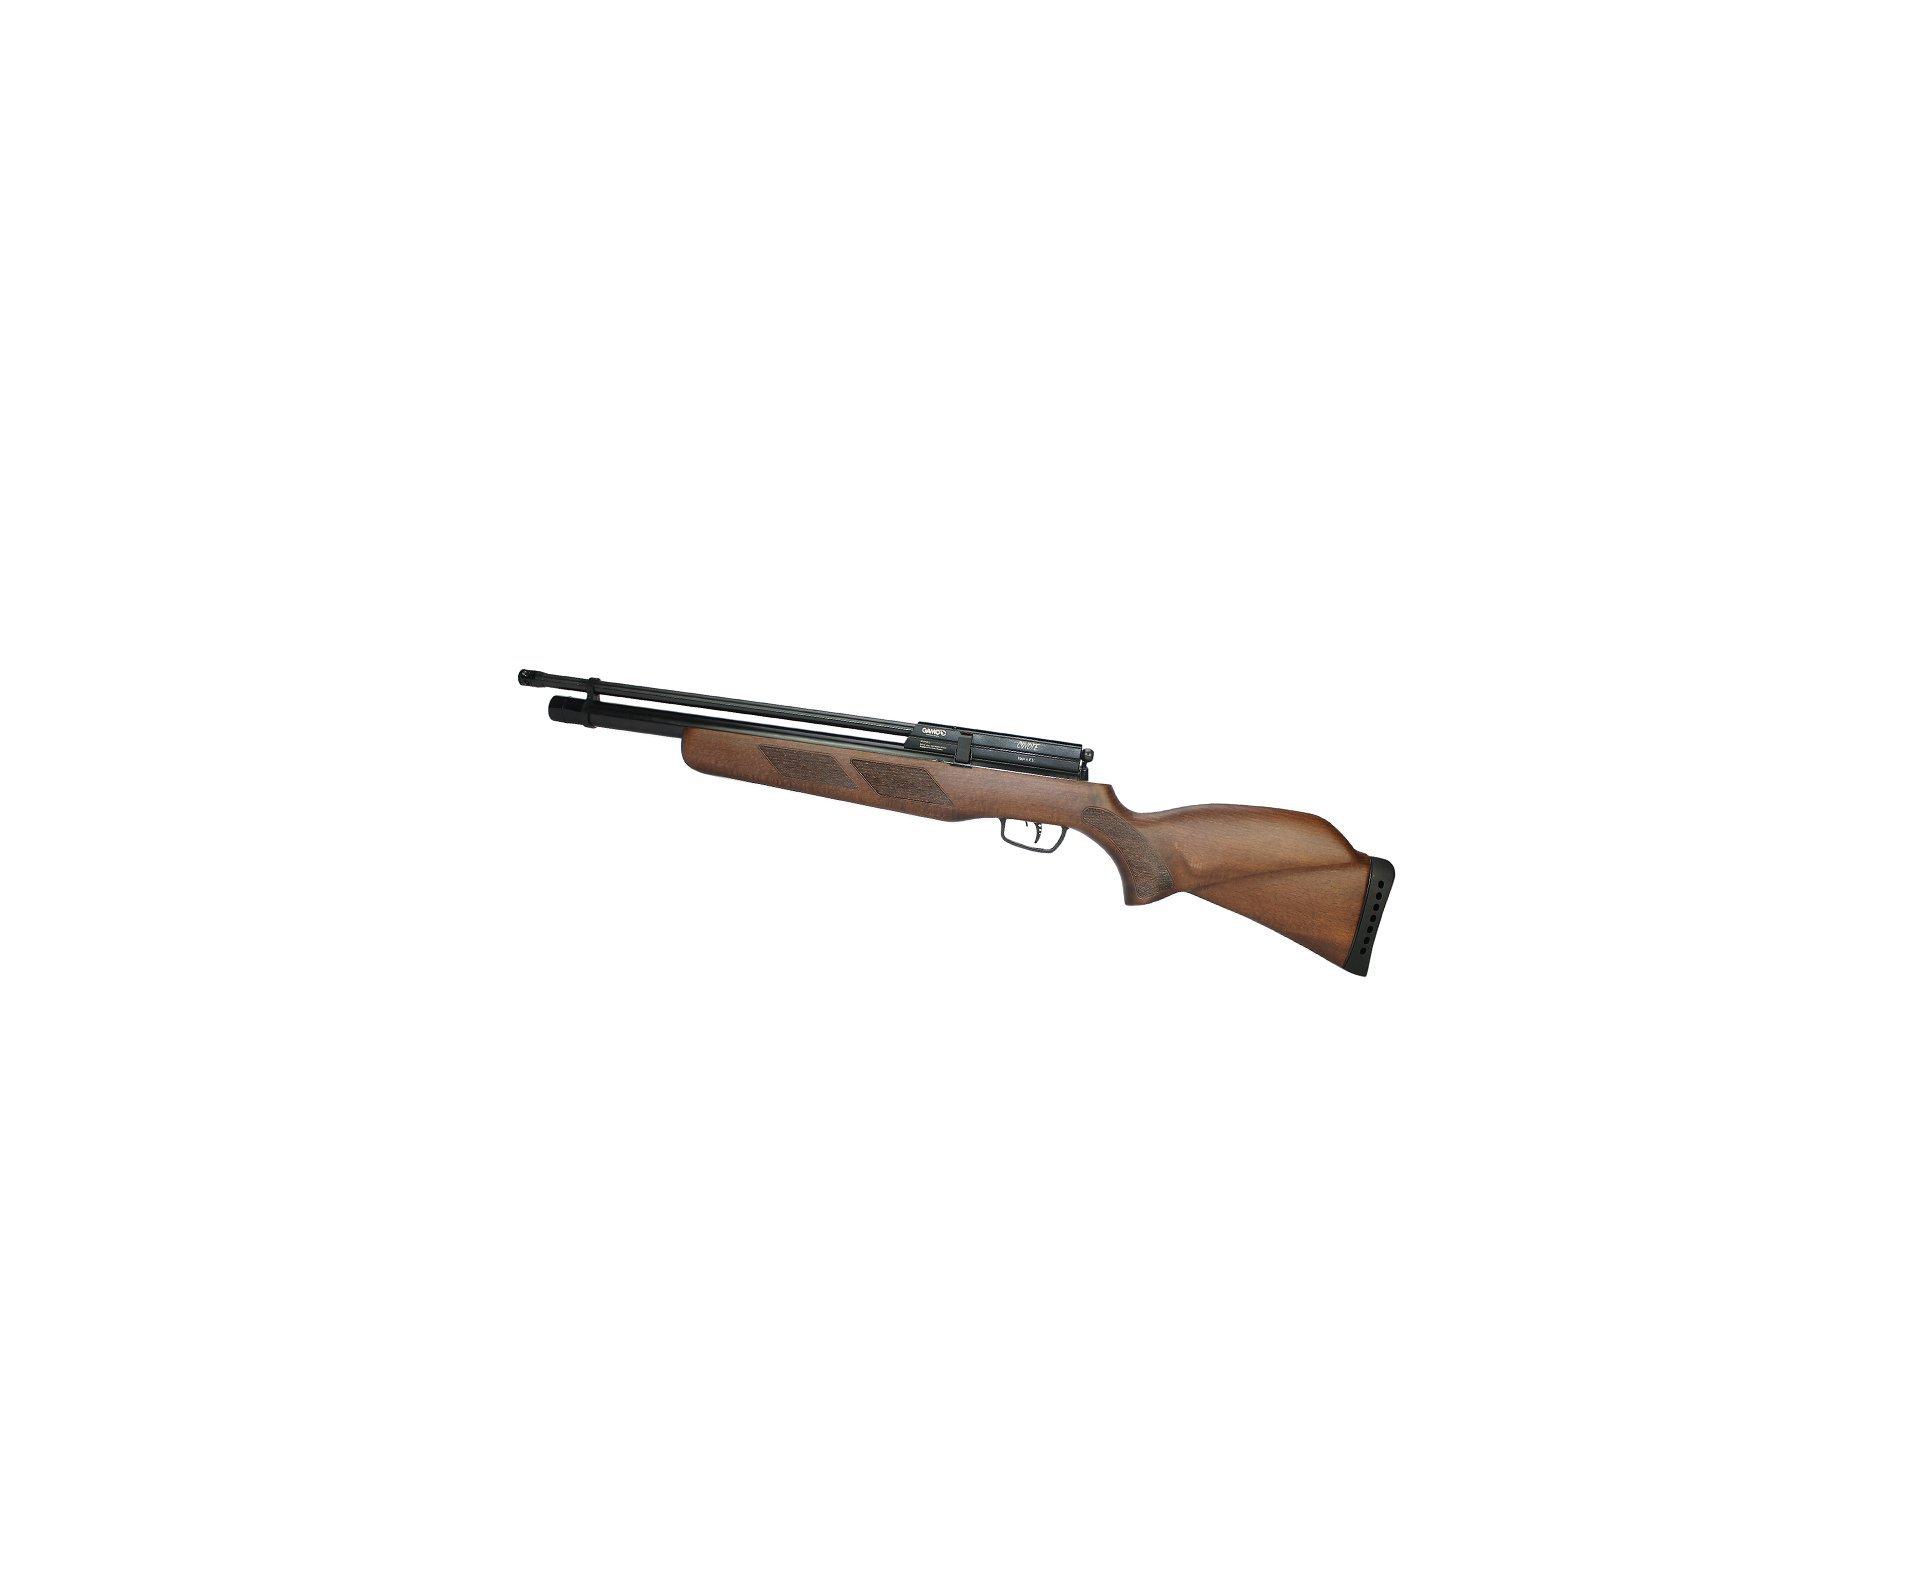 Carabina Pcp Gamo Coyote - Madeira Cal 5,5mm + Bomba Hand Pump Inox - Gamo